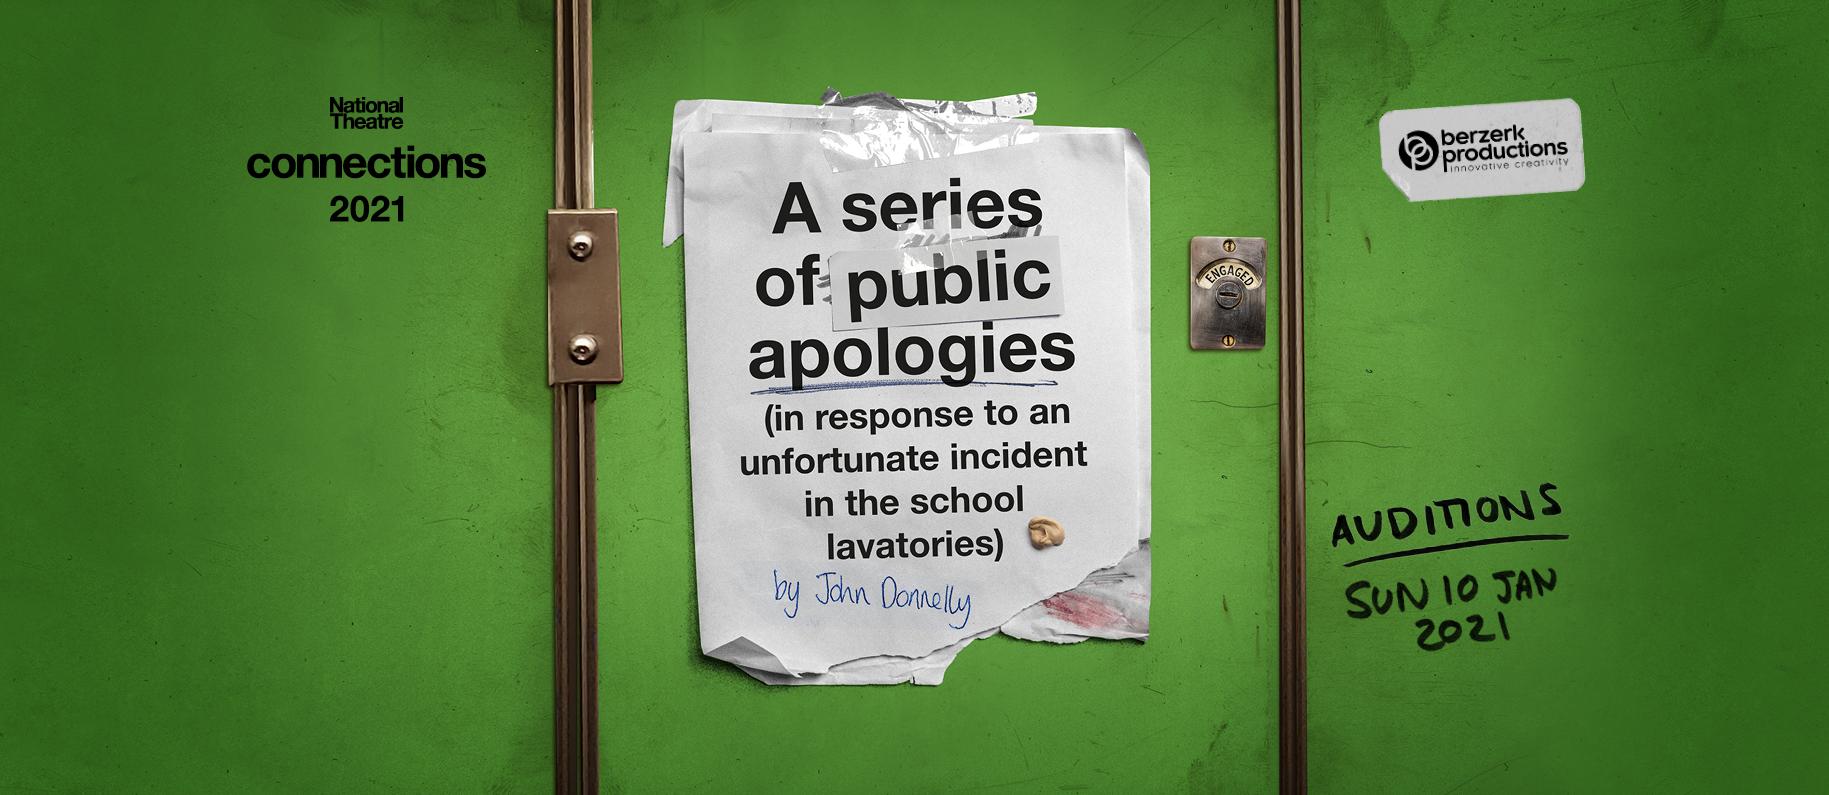 berzerk-a-series-of-public-apologies-2020